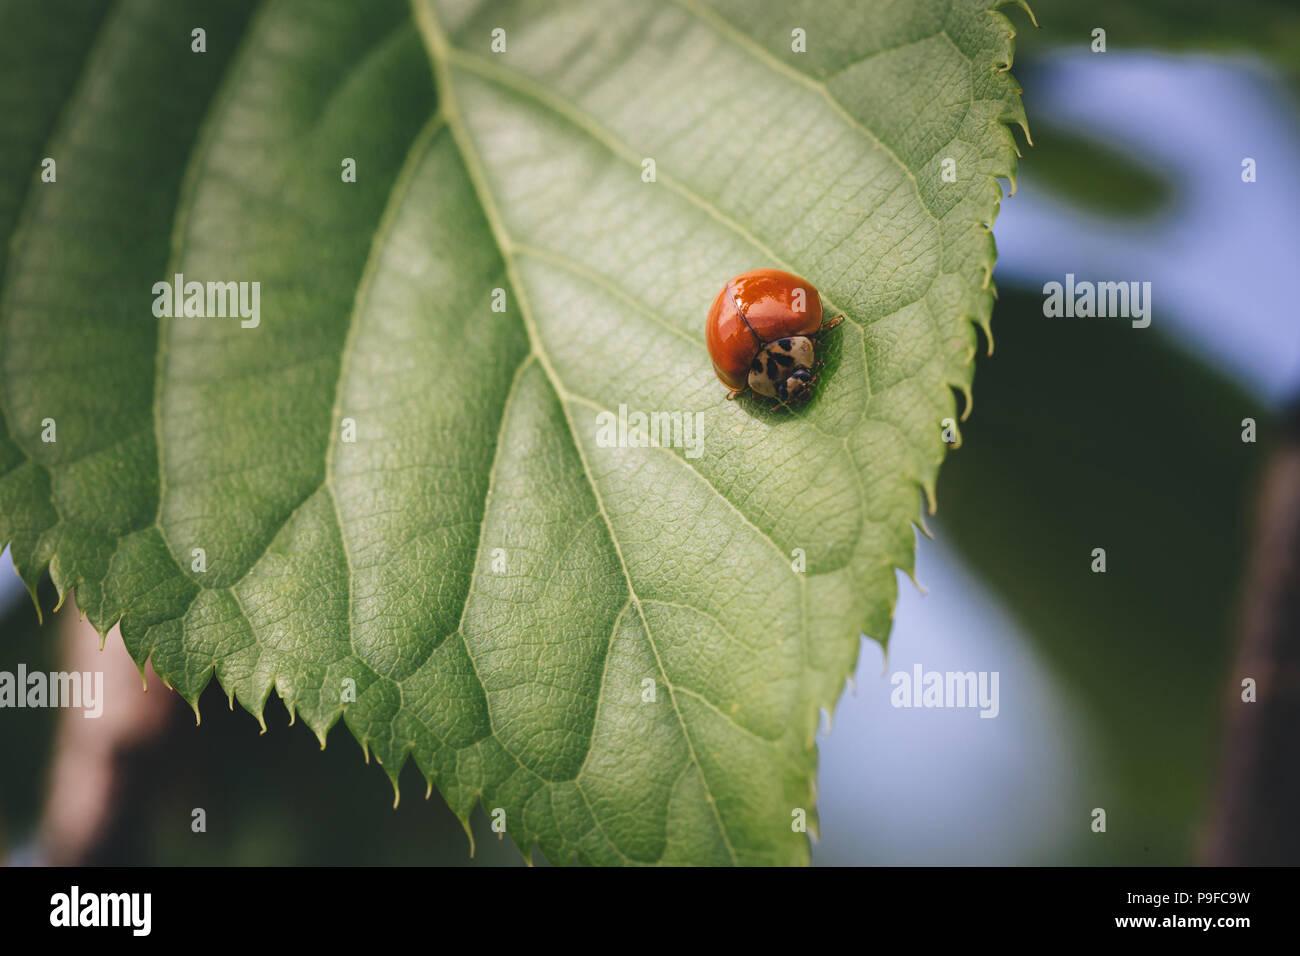 Ladybug rojo sobre verde hoja de frambuesa. Foto de stock